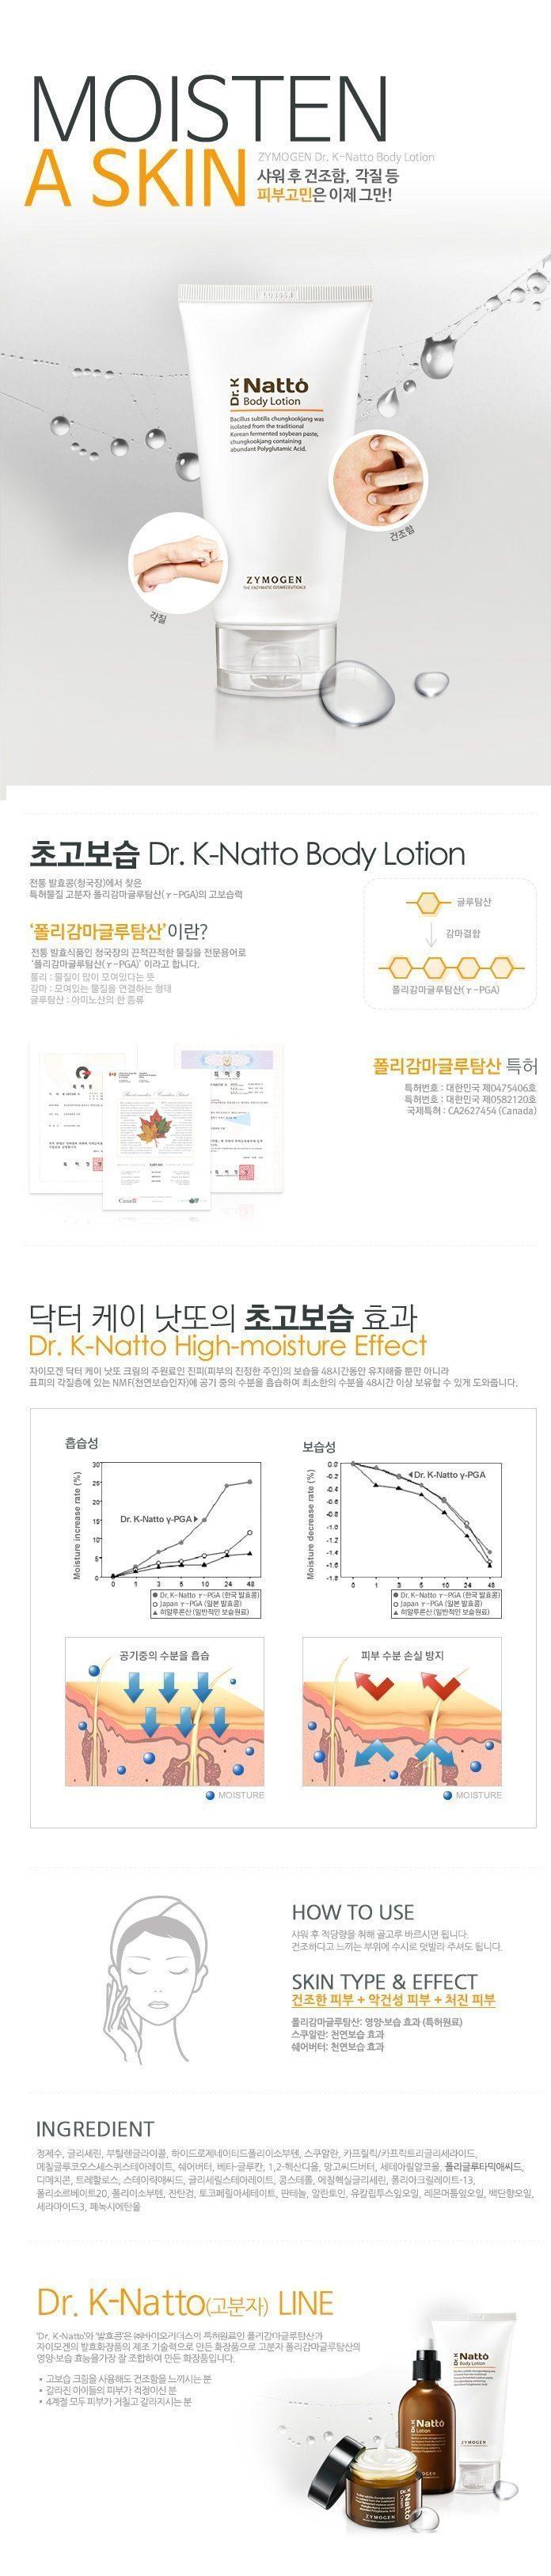 Zymogen Dr. K Natto Body Lotion korean cosmetic skincar product online shop malaysia brazil macau1